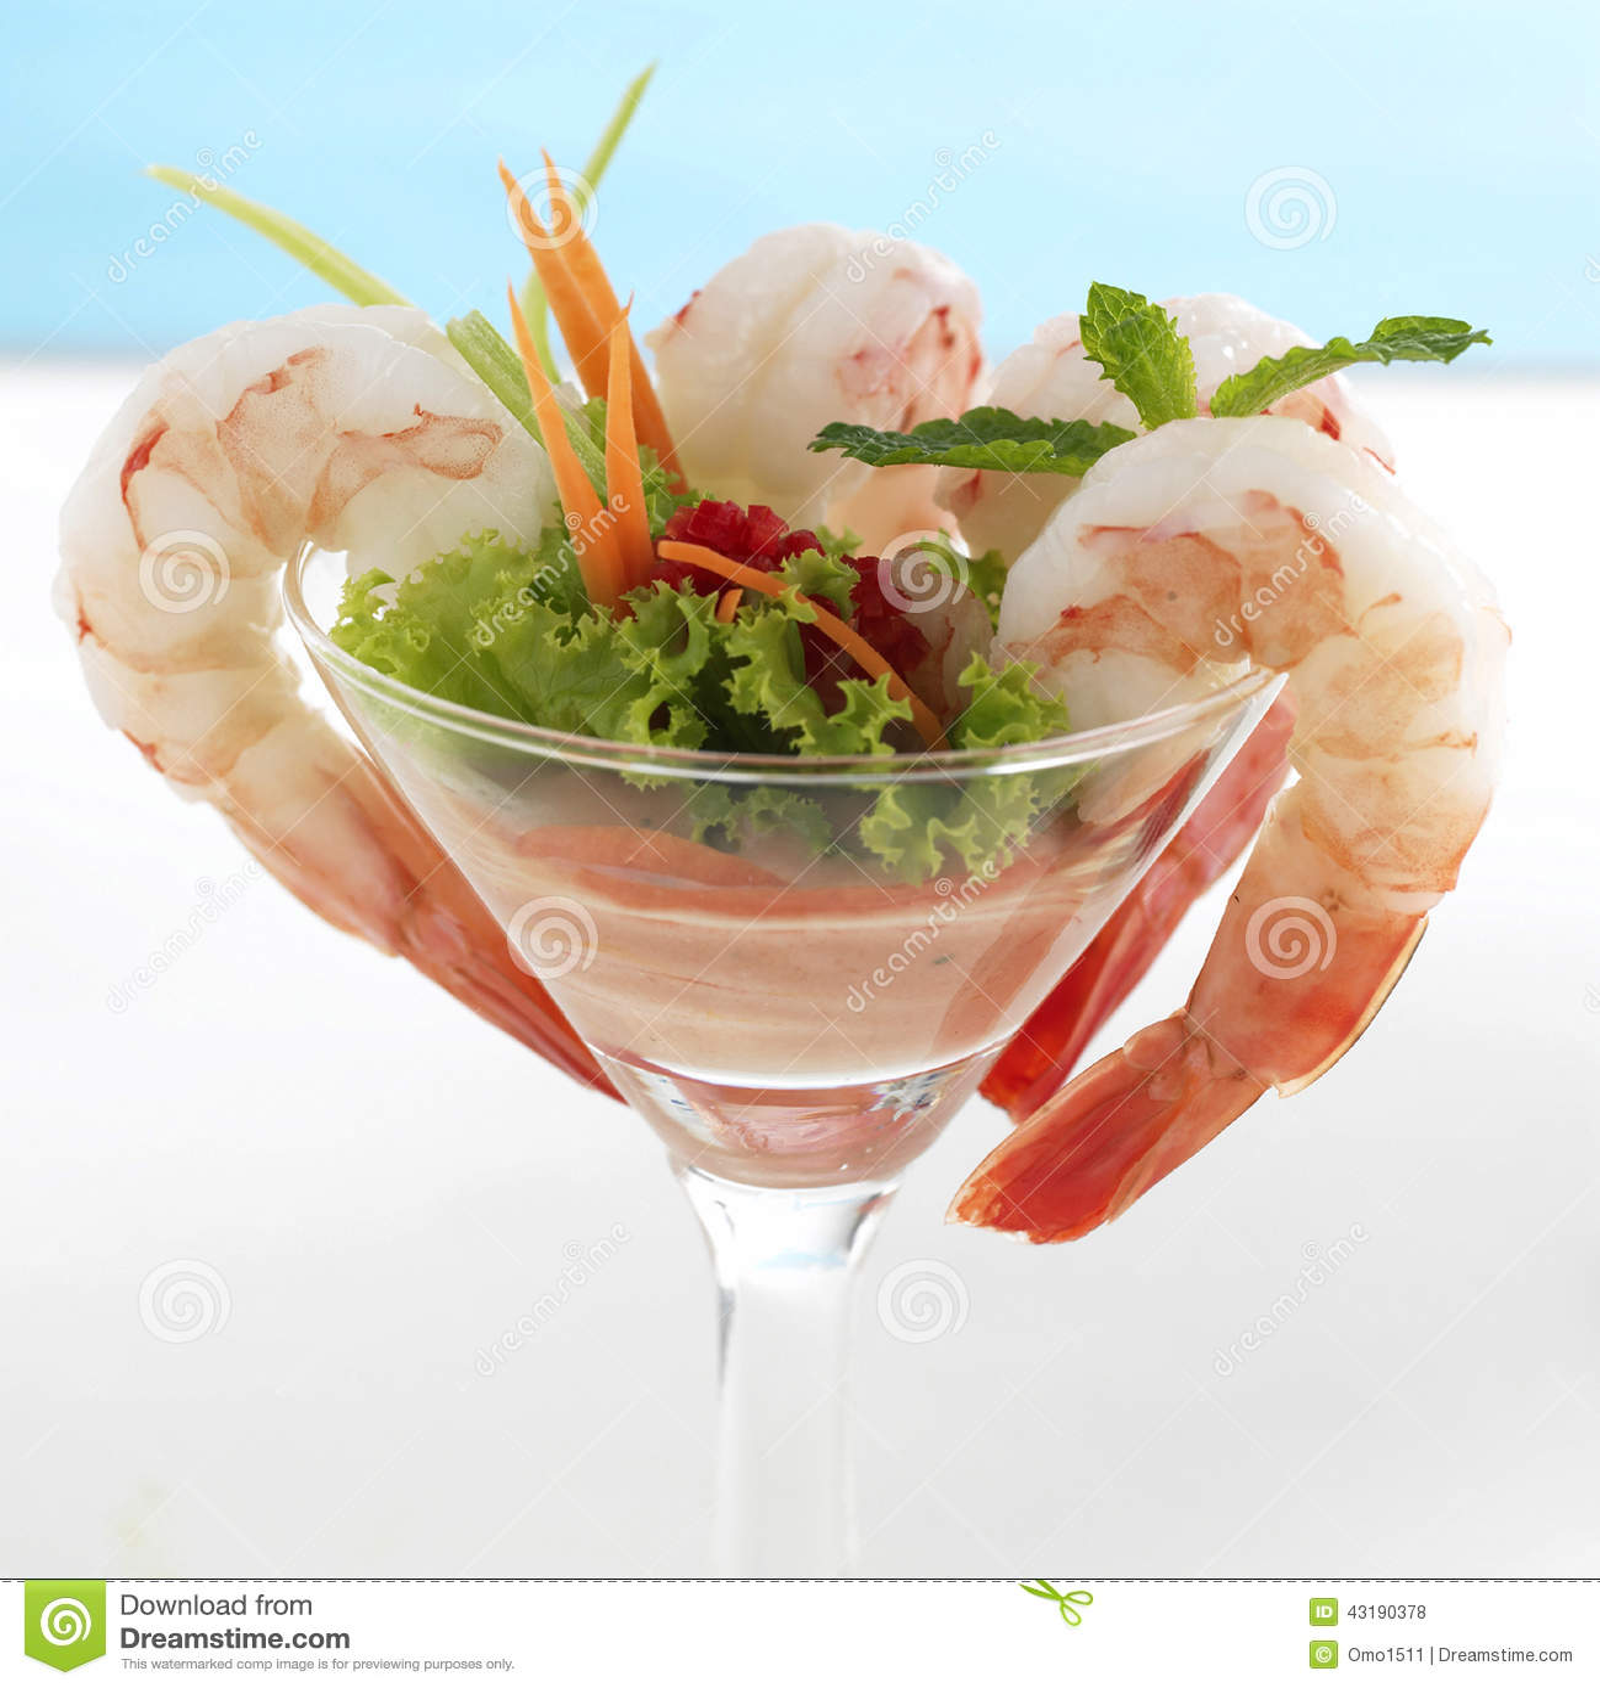 Shrimp or Prawn Cocktail. on a White Background. Health